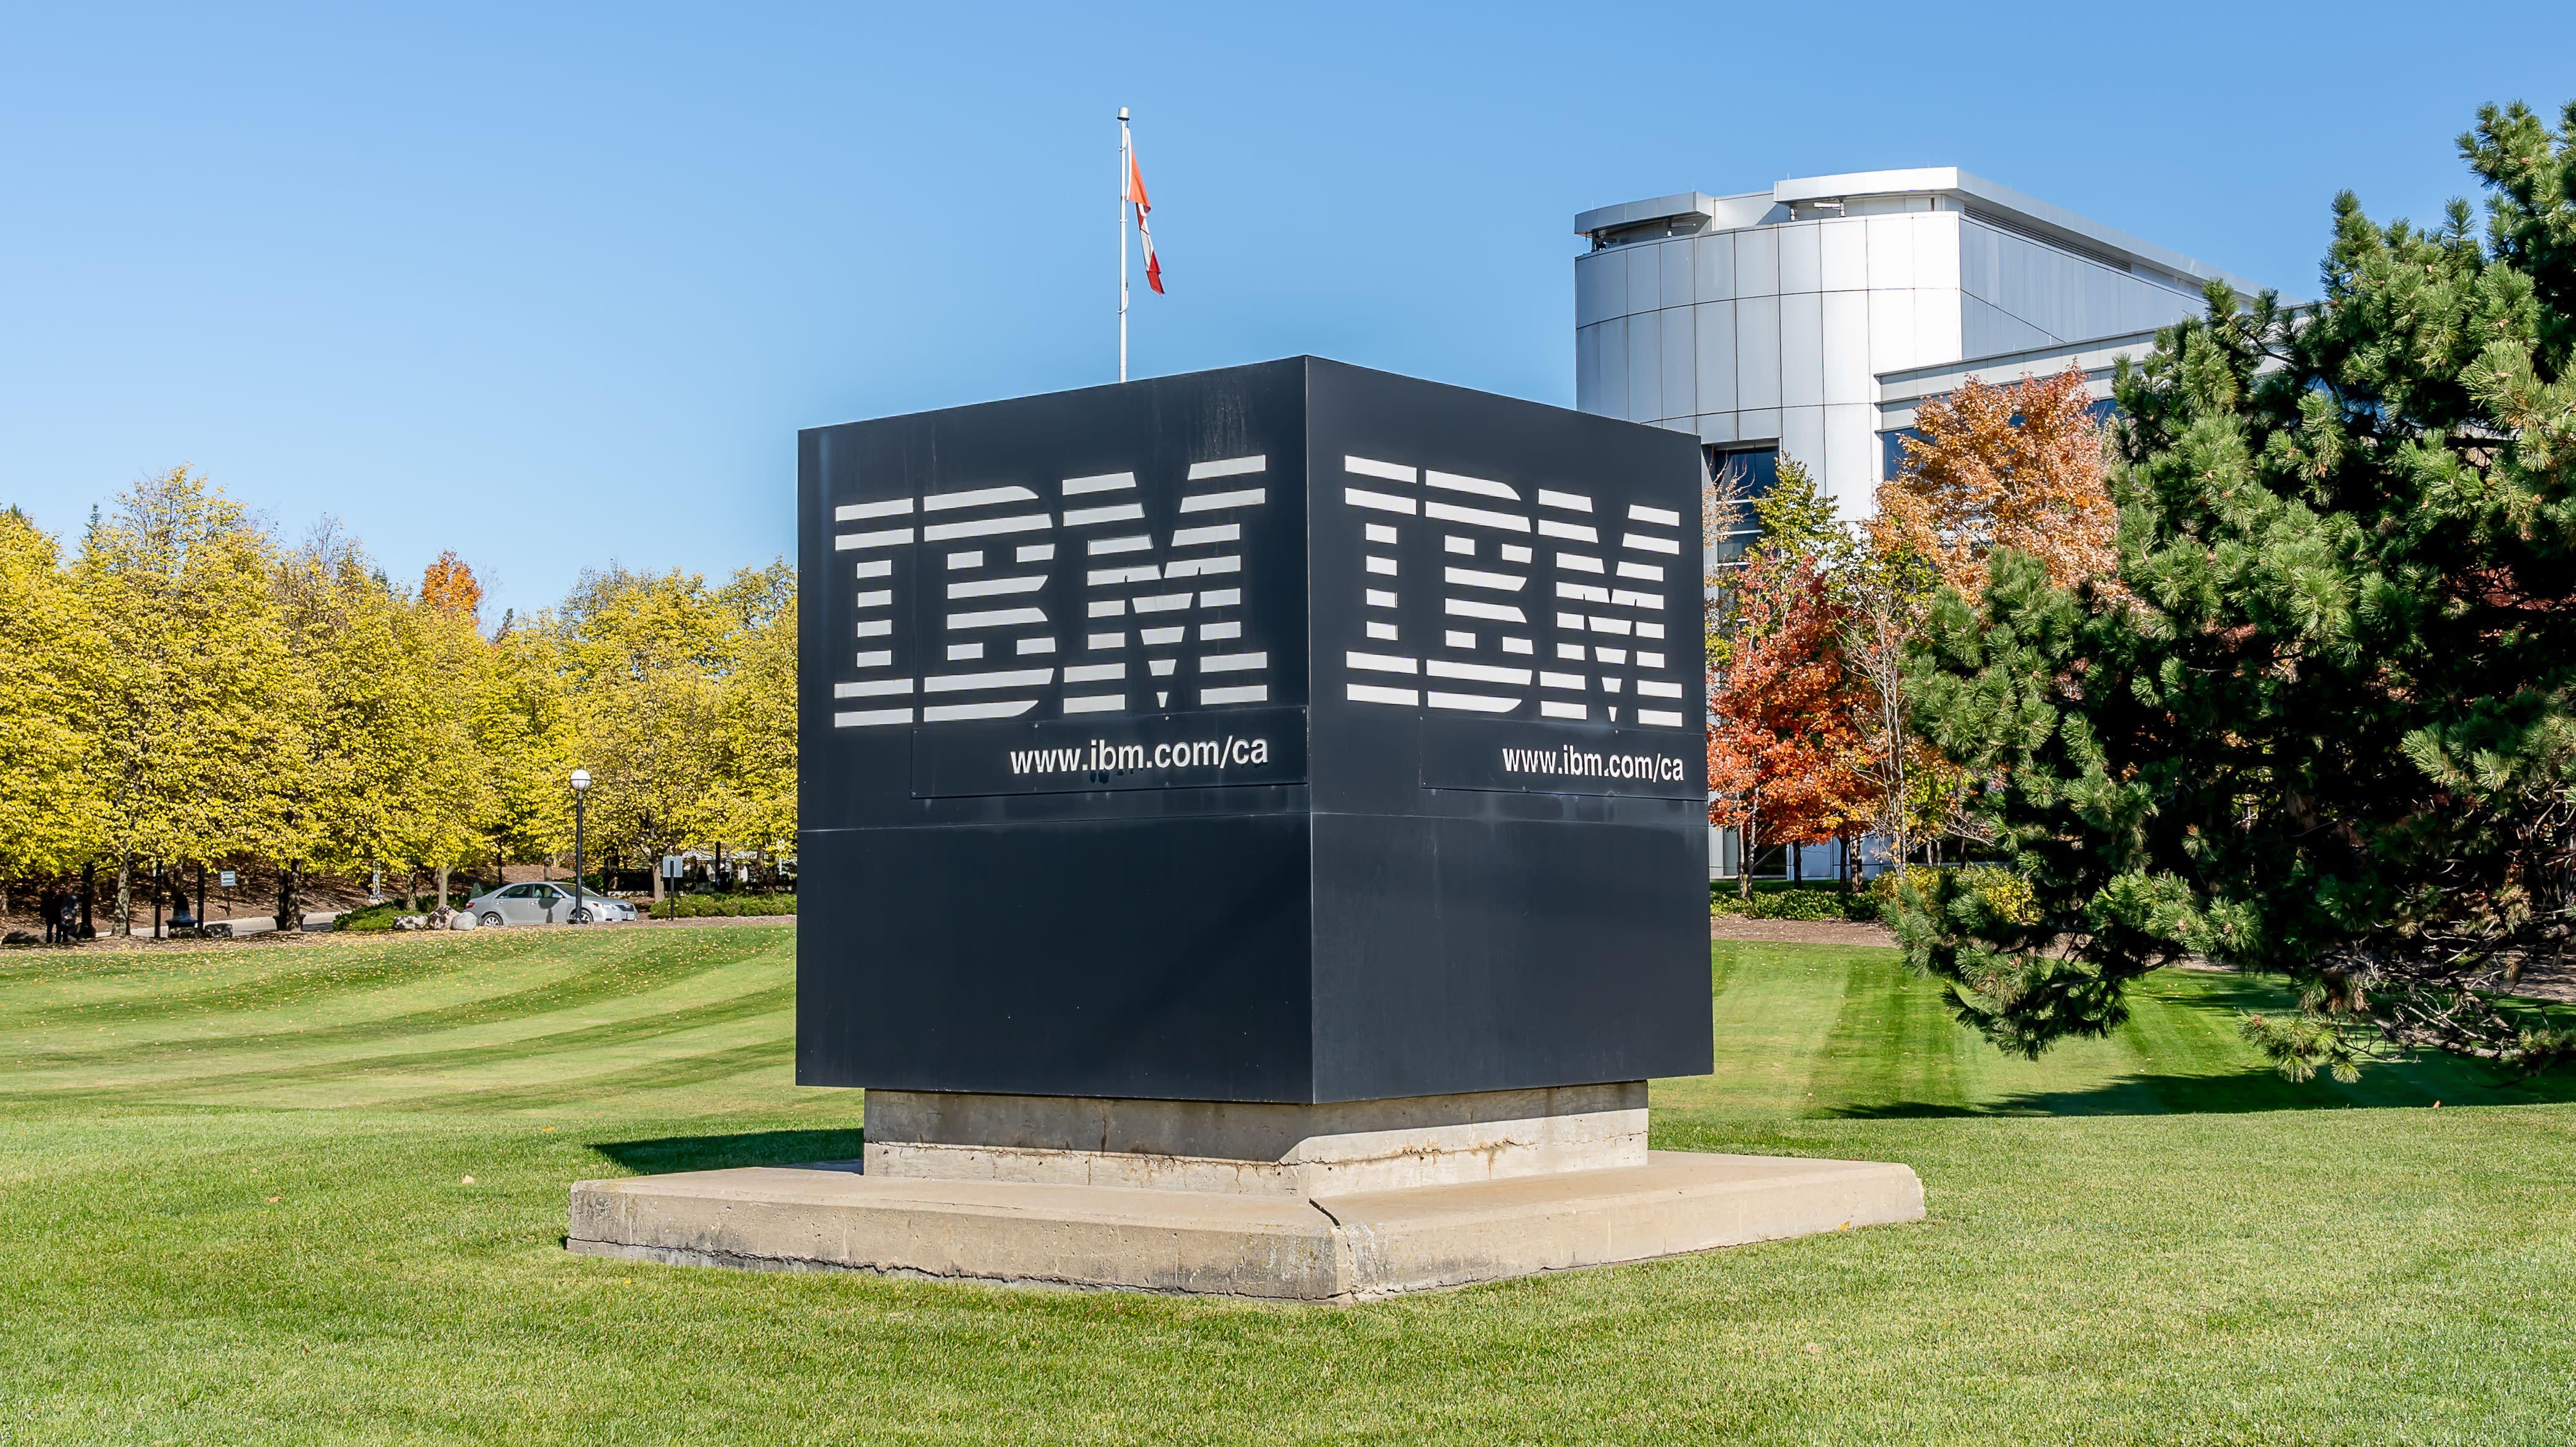 IBM revenue declined in latest earnings amid coronavirus crisis